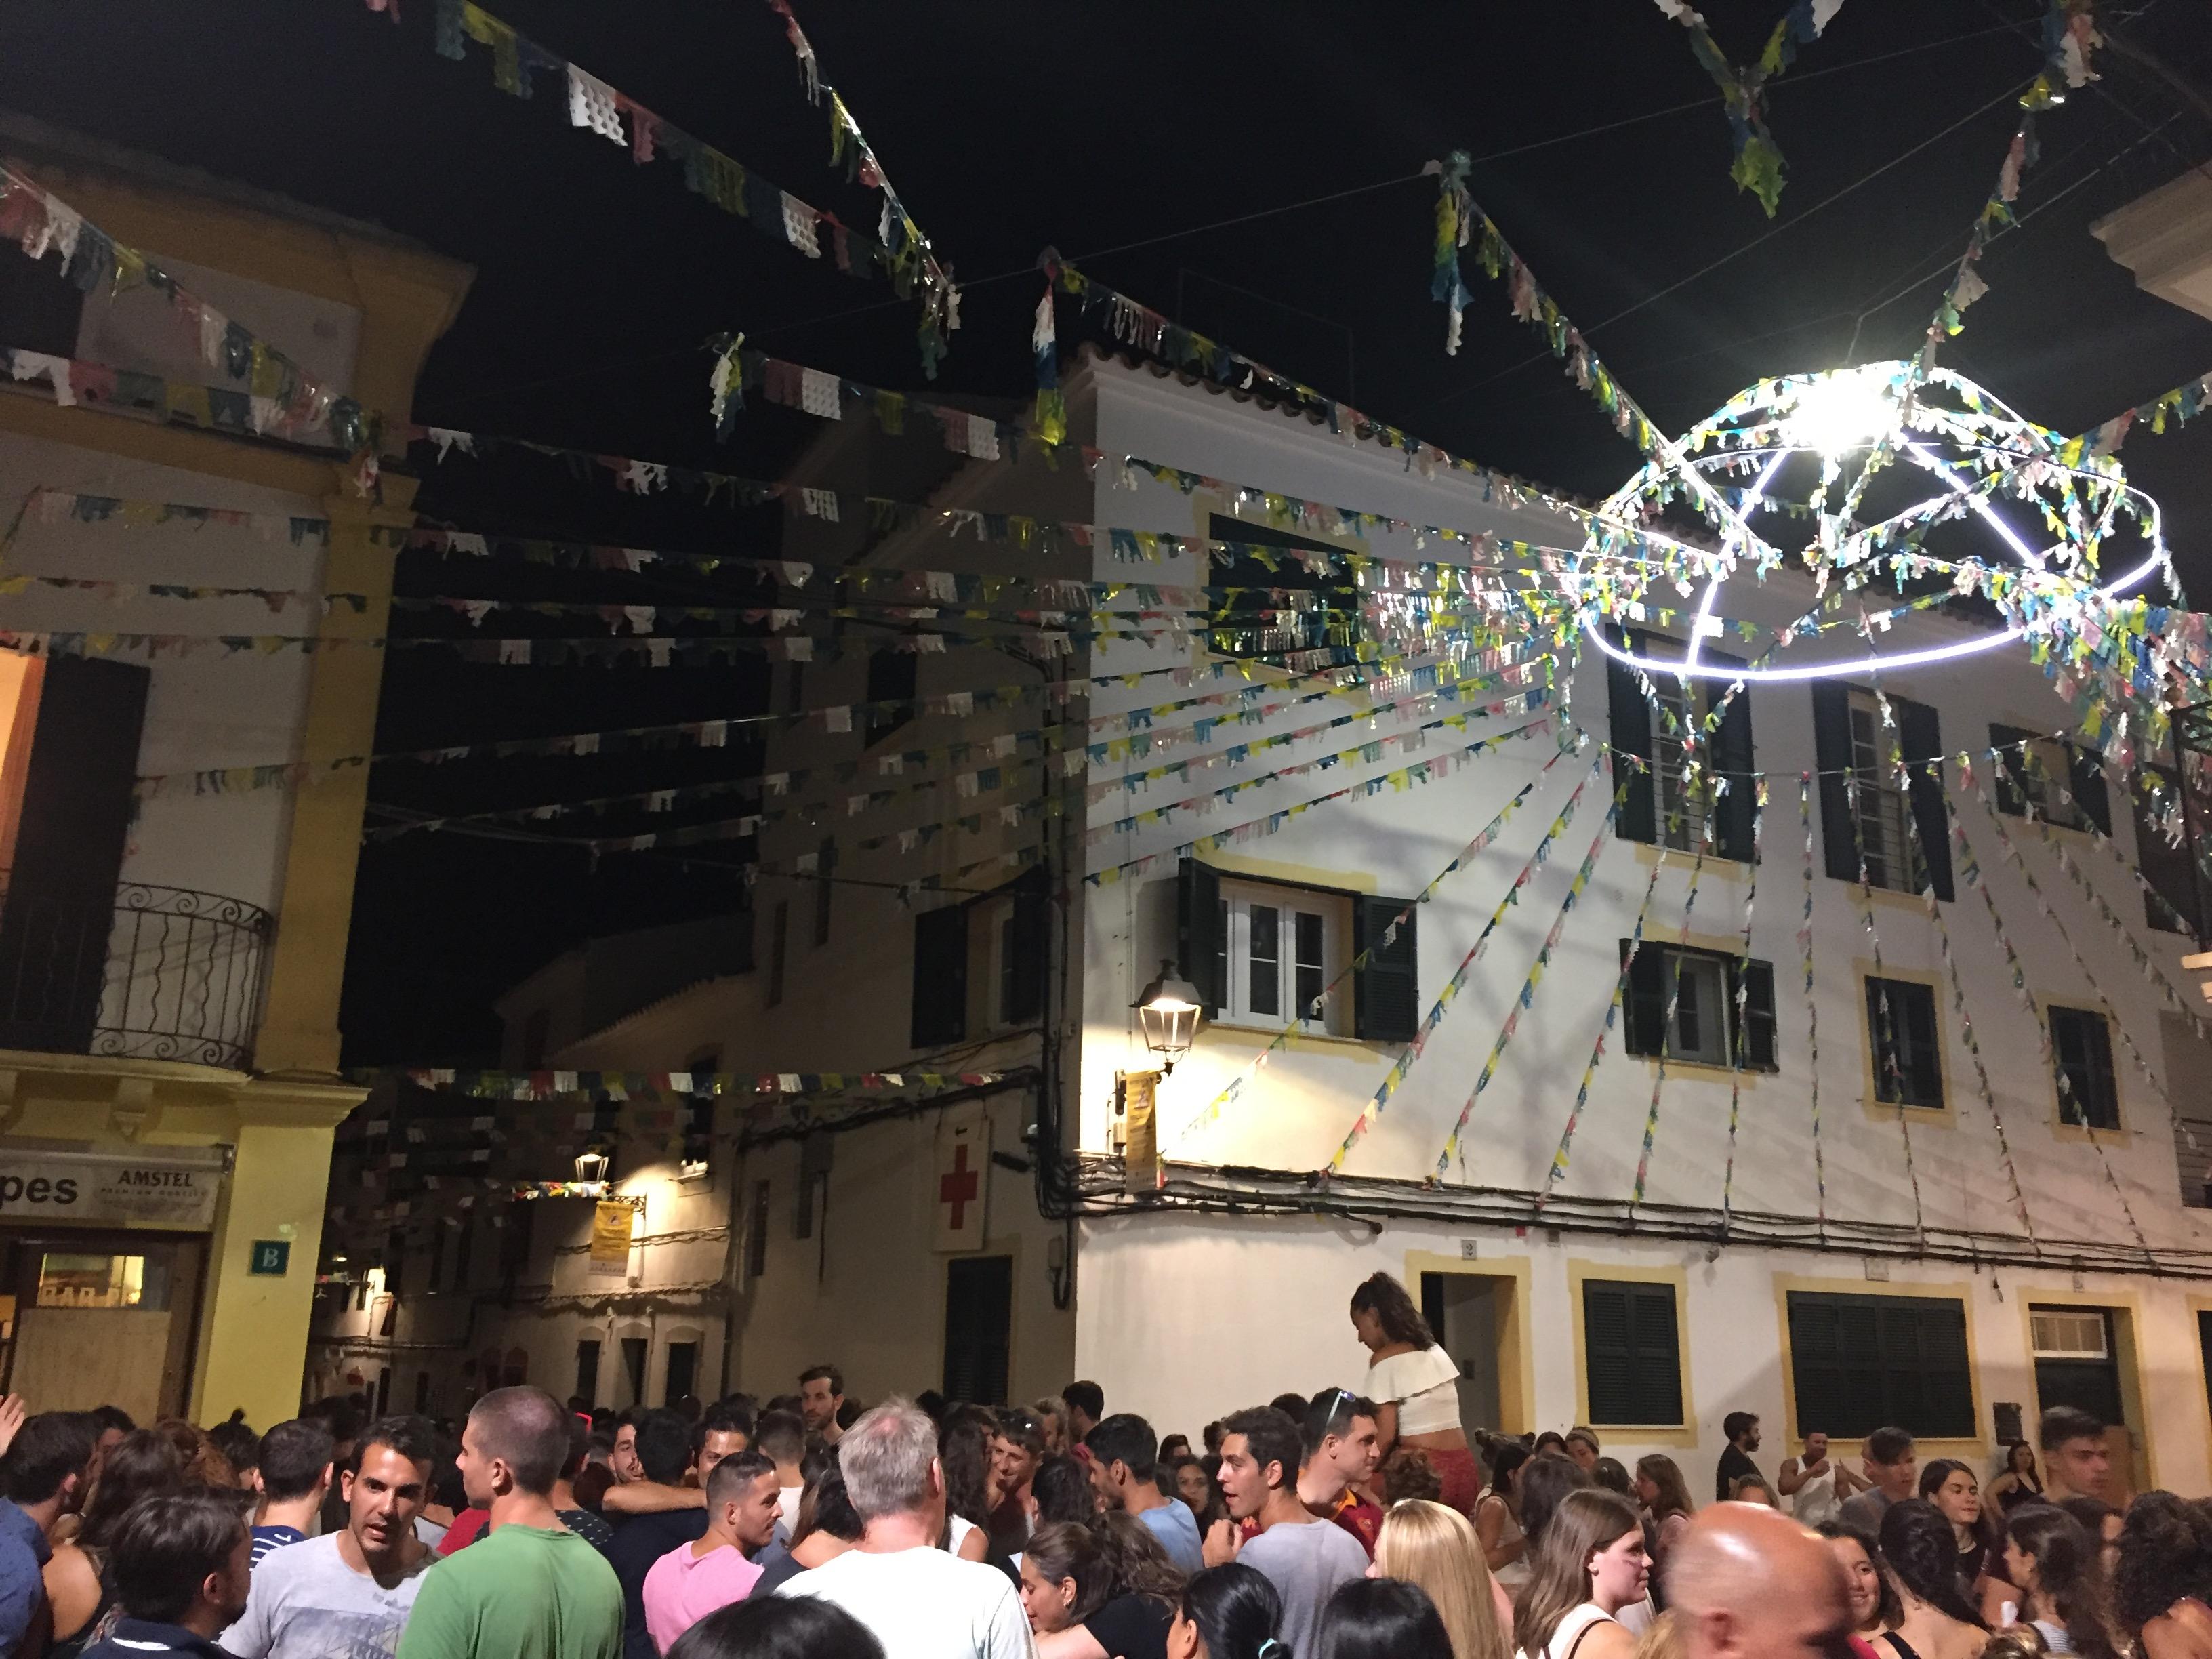 07292017 Nigh Festes de Sant Cristófol Es Migjorn (4)